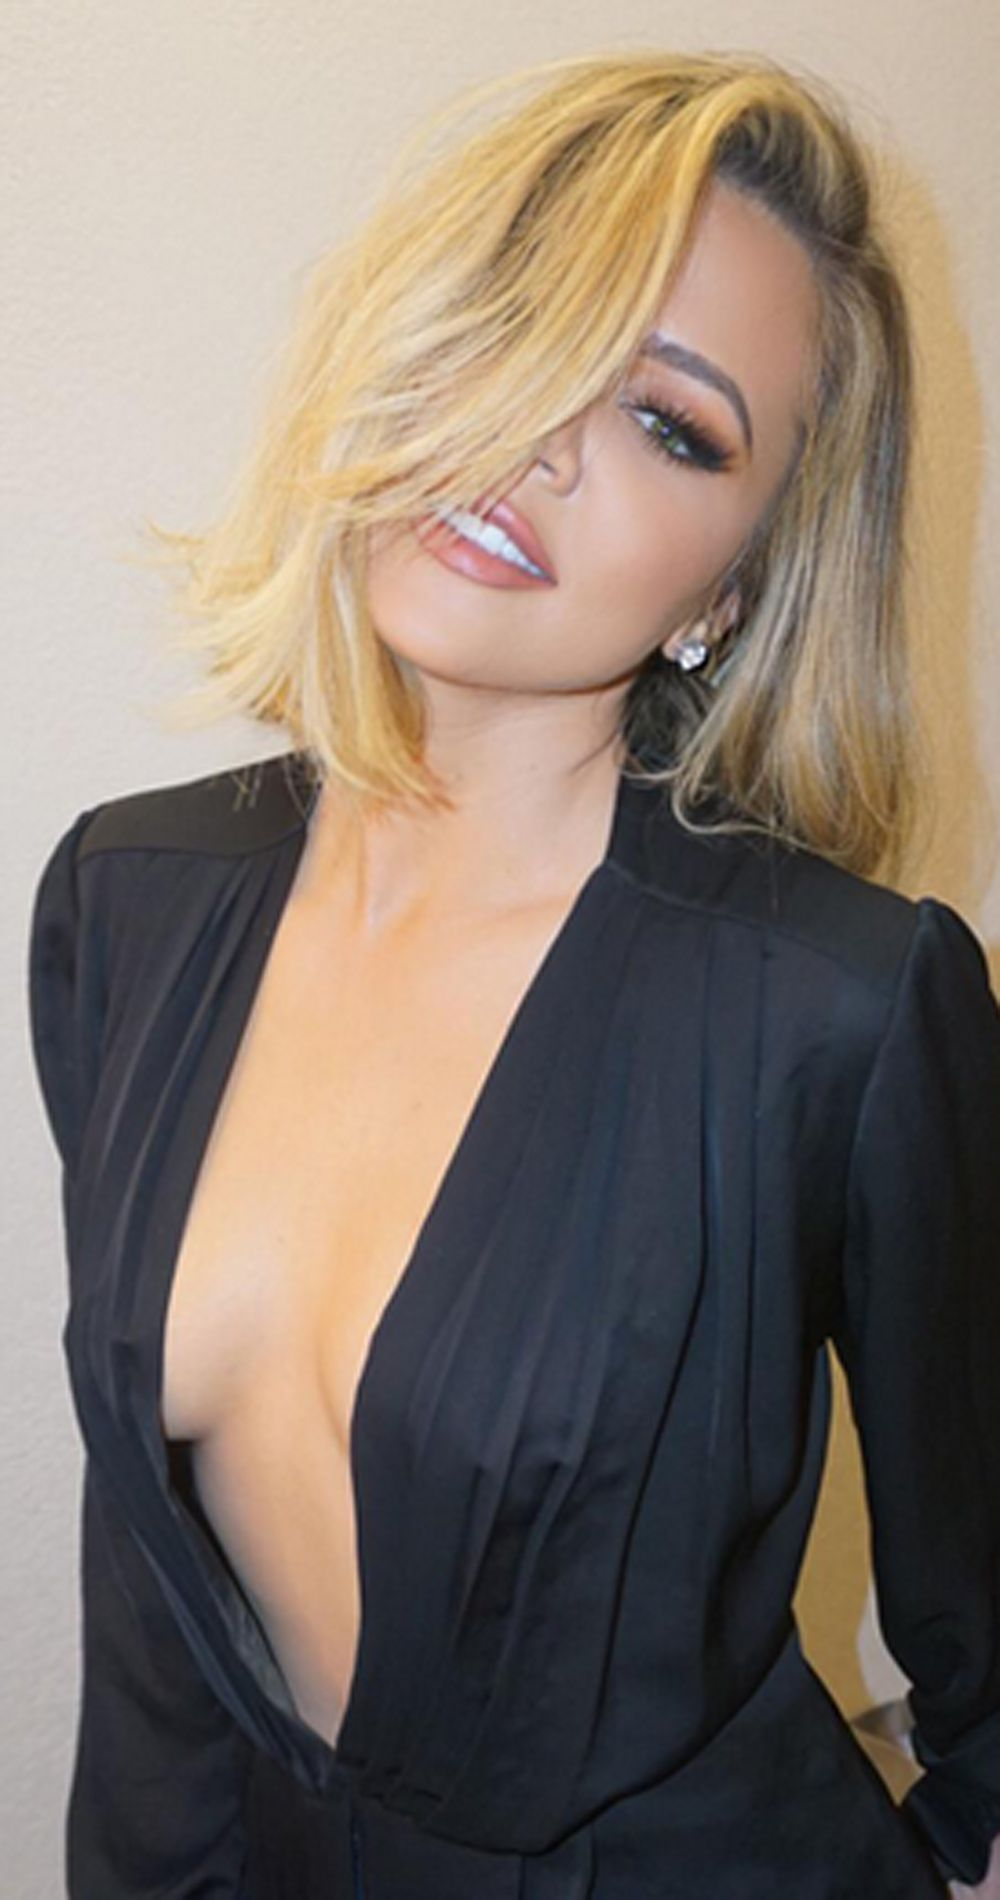 Fappening Khloe Kardashian nude (41 photo), Tits, Cleavage, Selfie, cleavage 2015